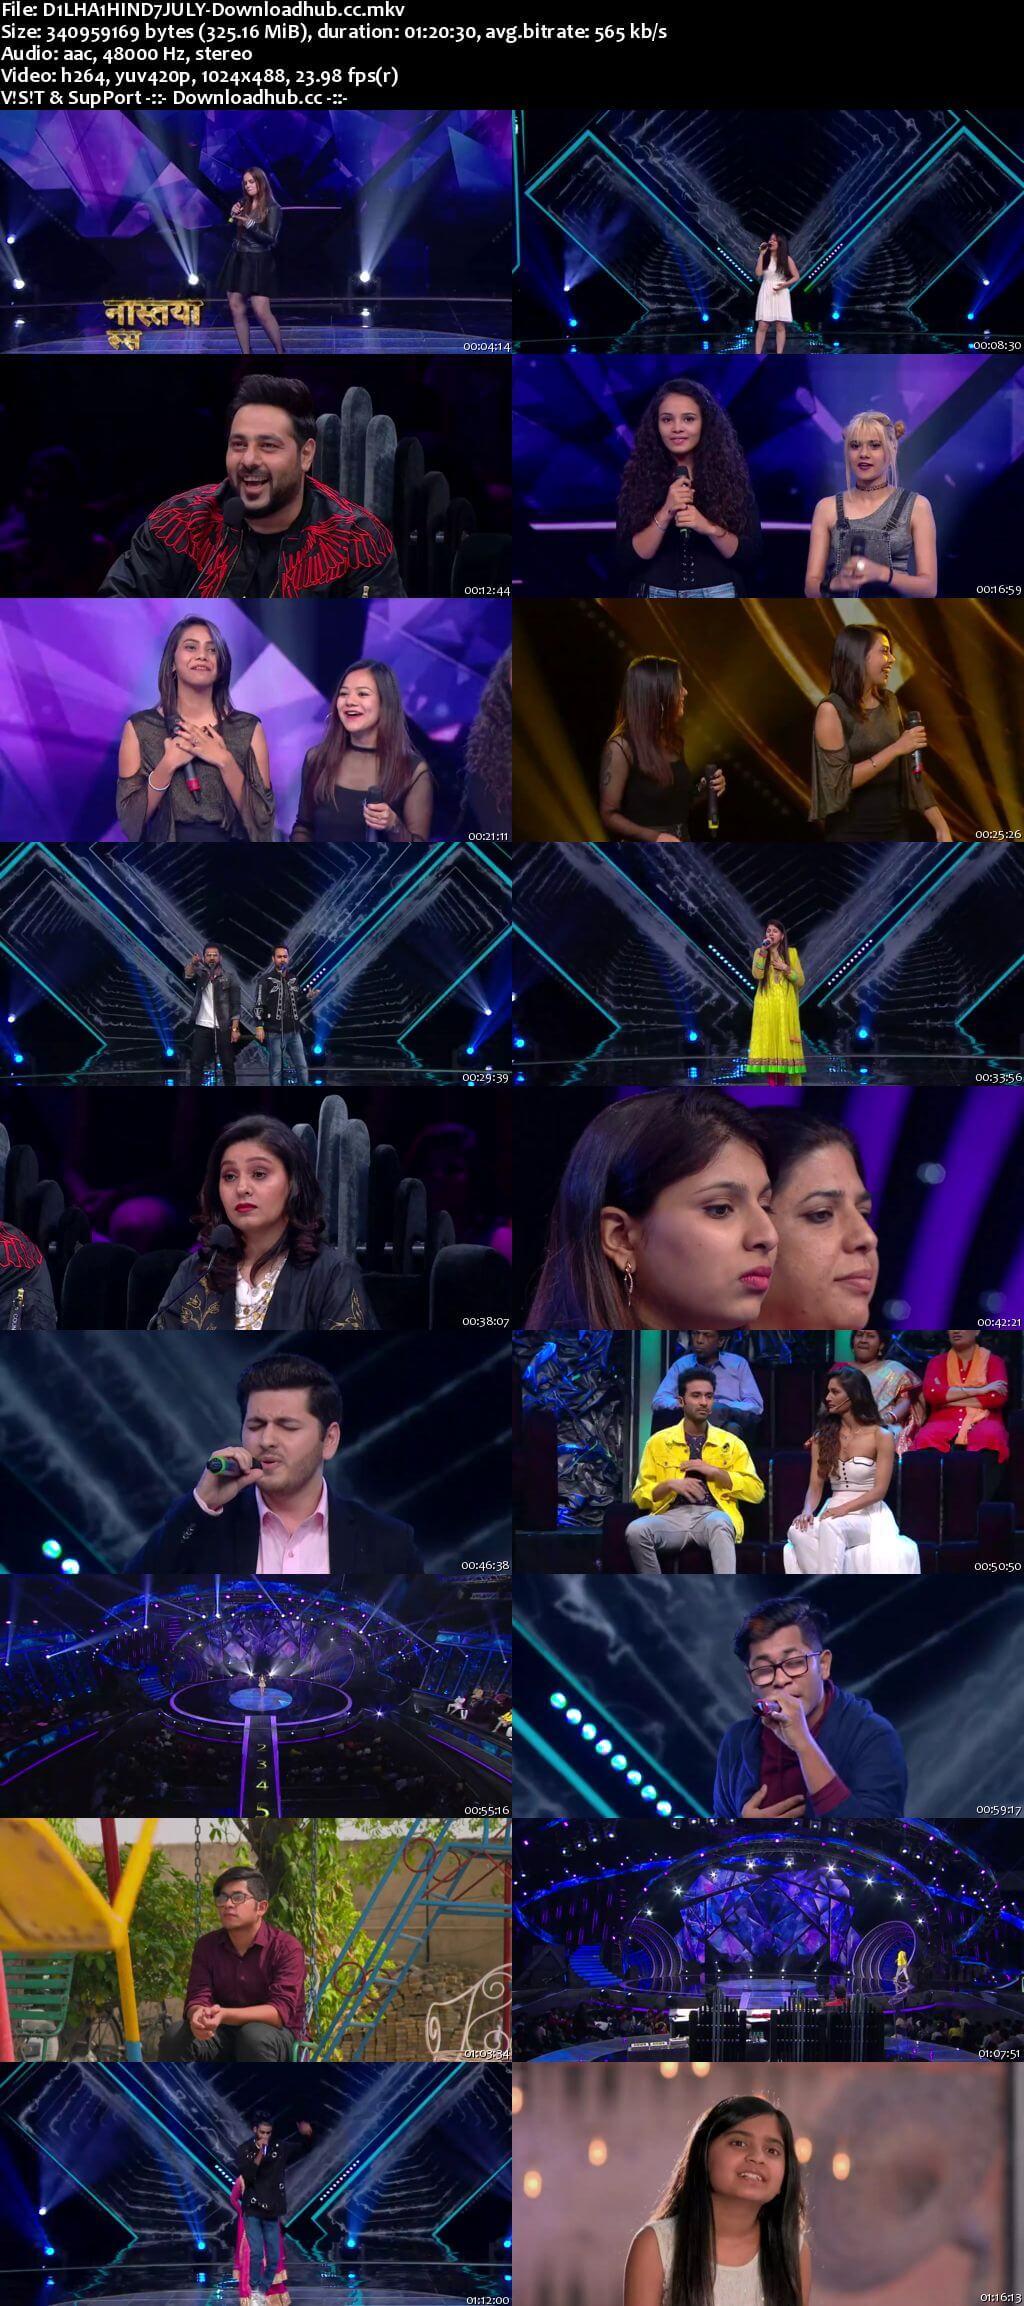 Dil Hai Hindustani 2 07 July 2018 Episode 01 HDTV 480p